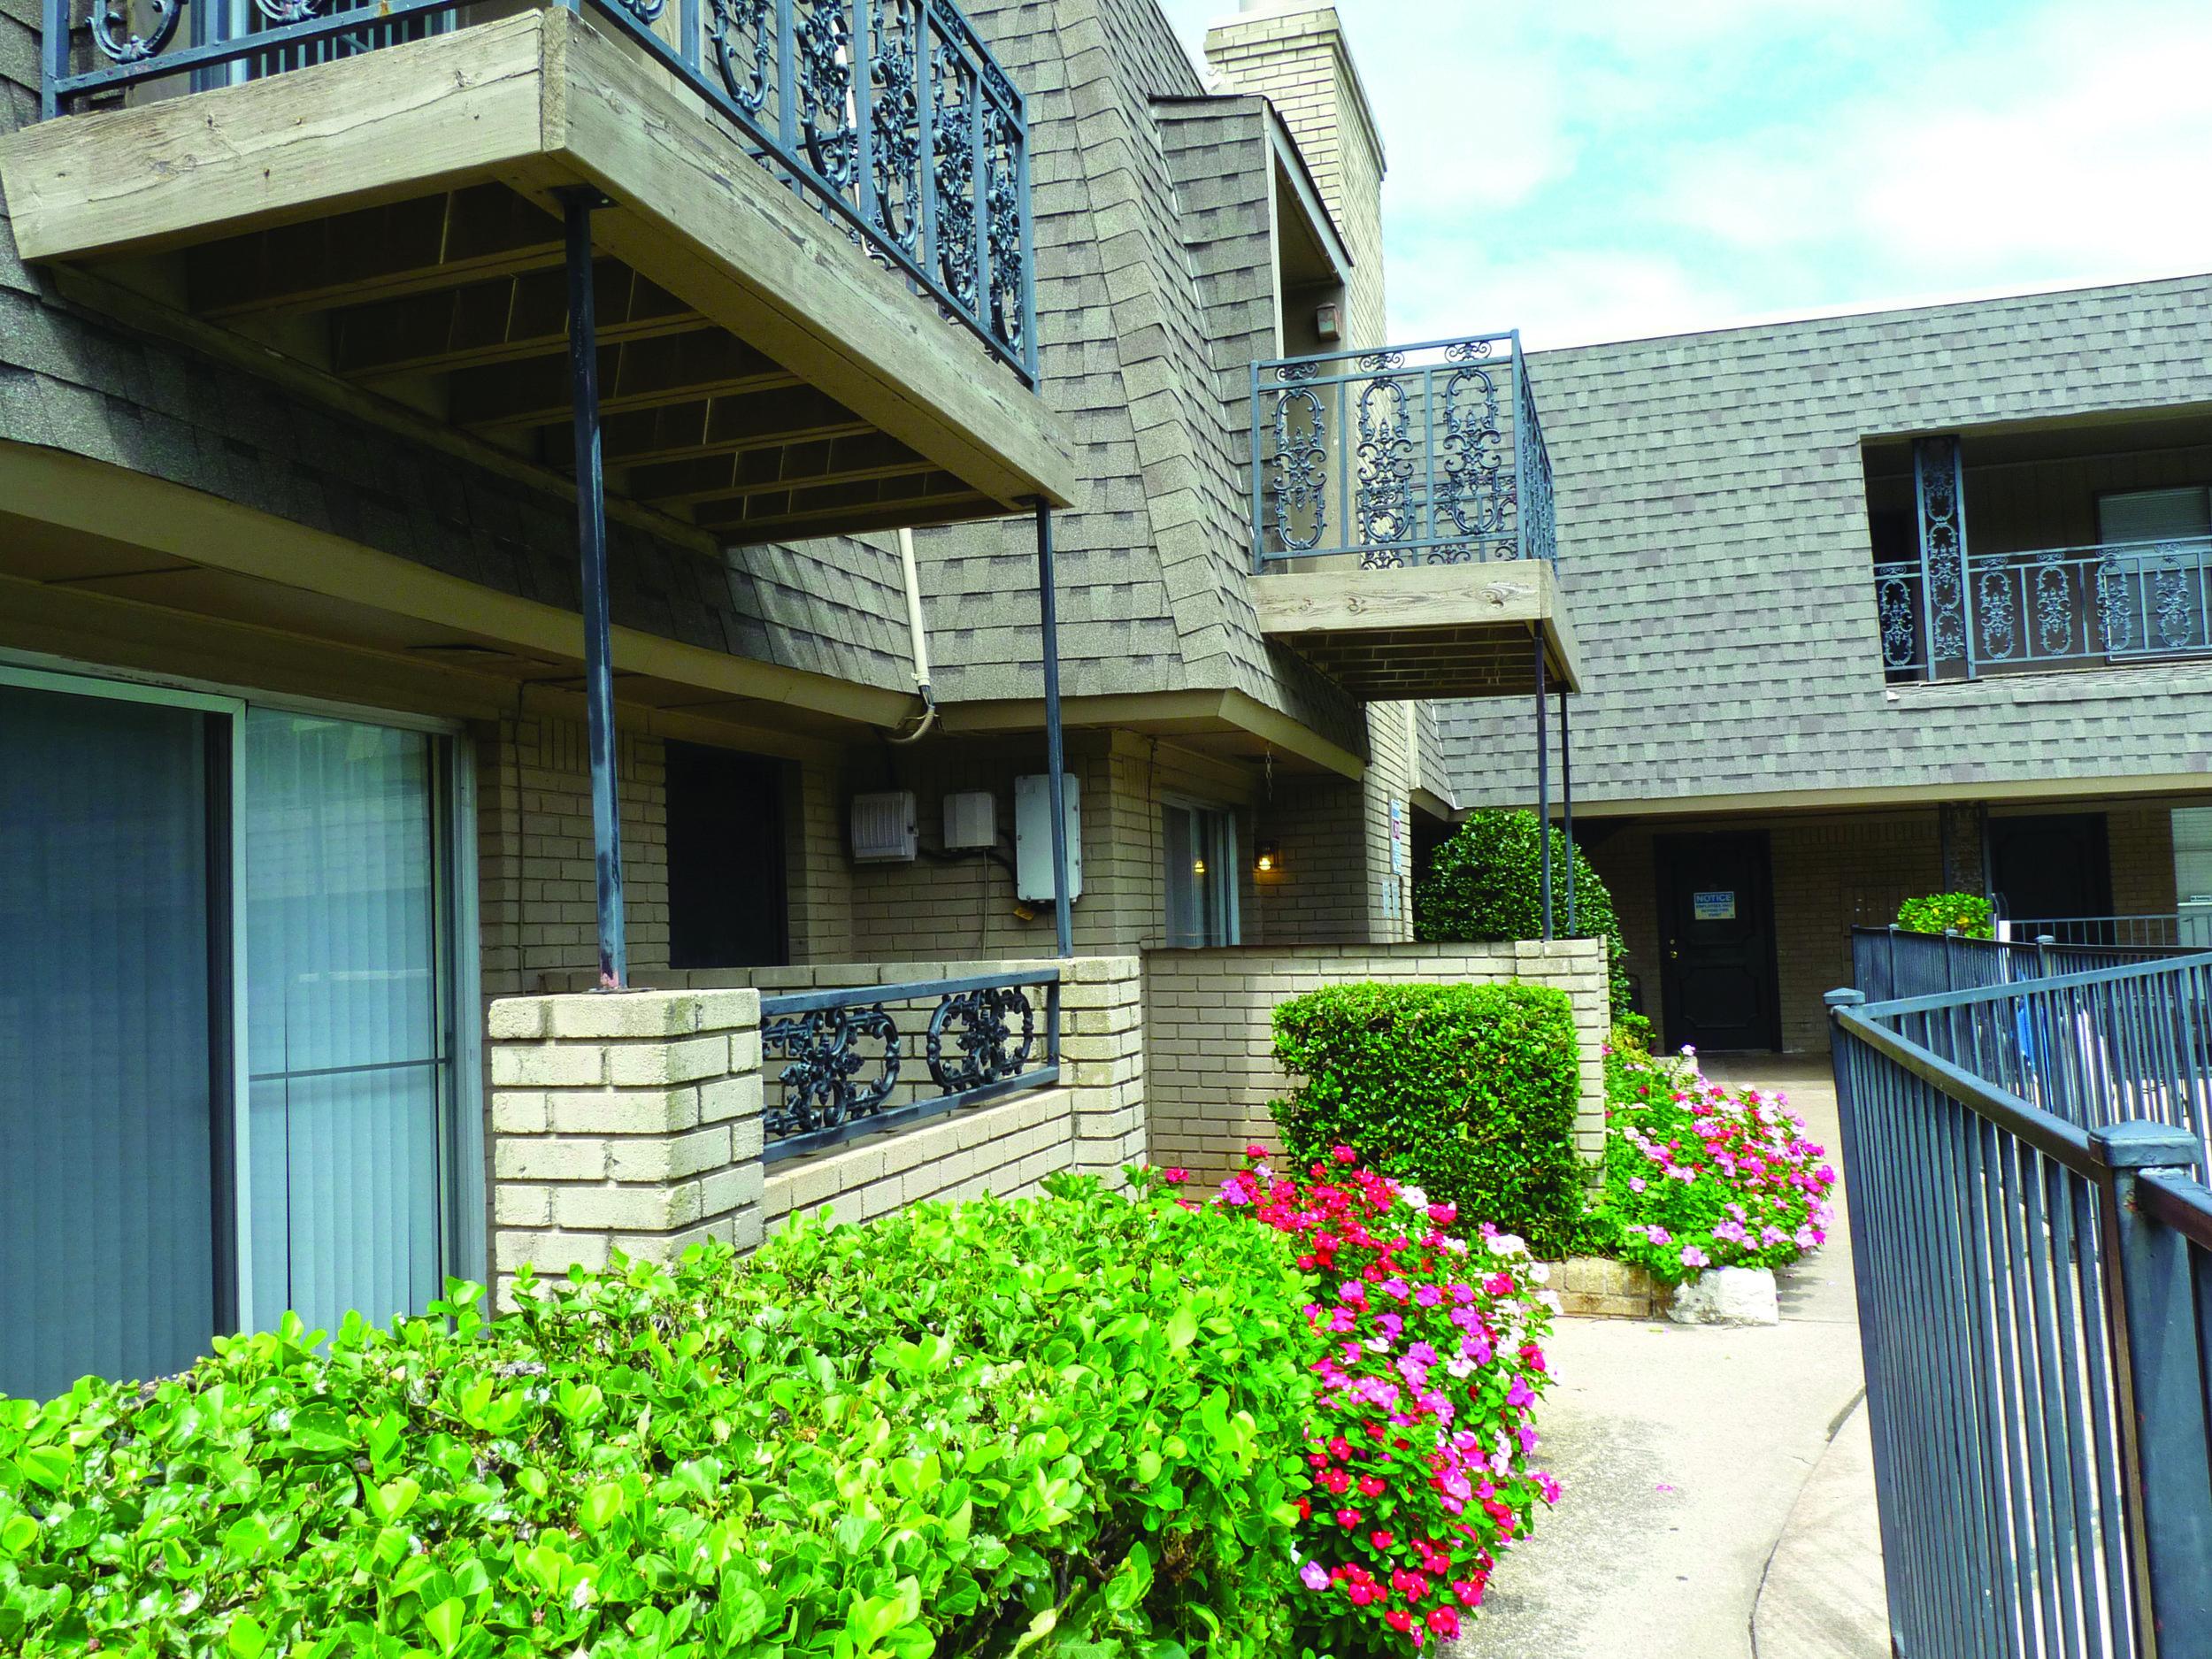 Citadel Suites balcony2 enh-rev.jpg